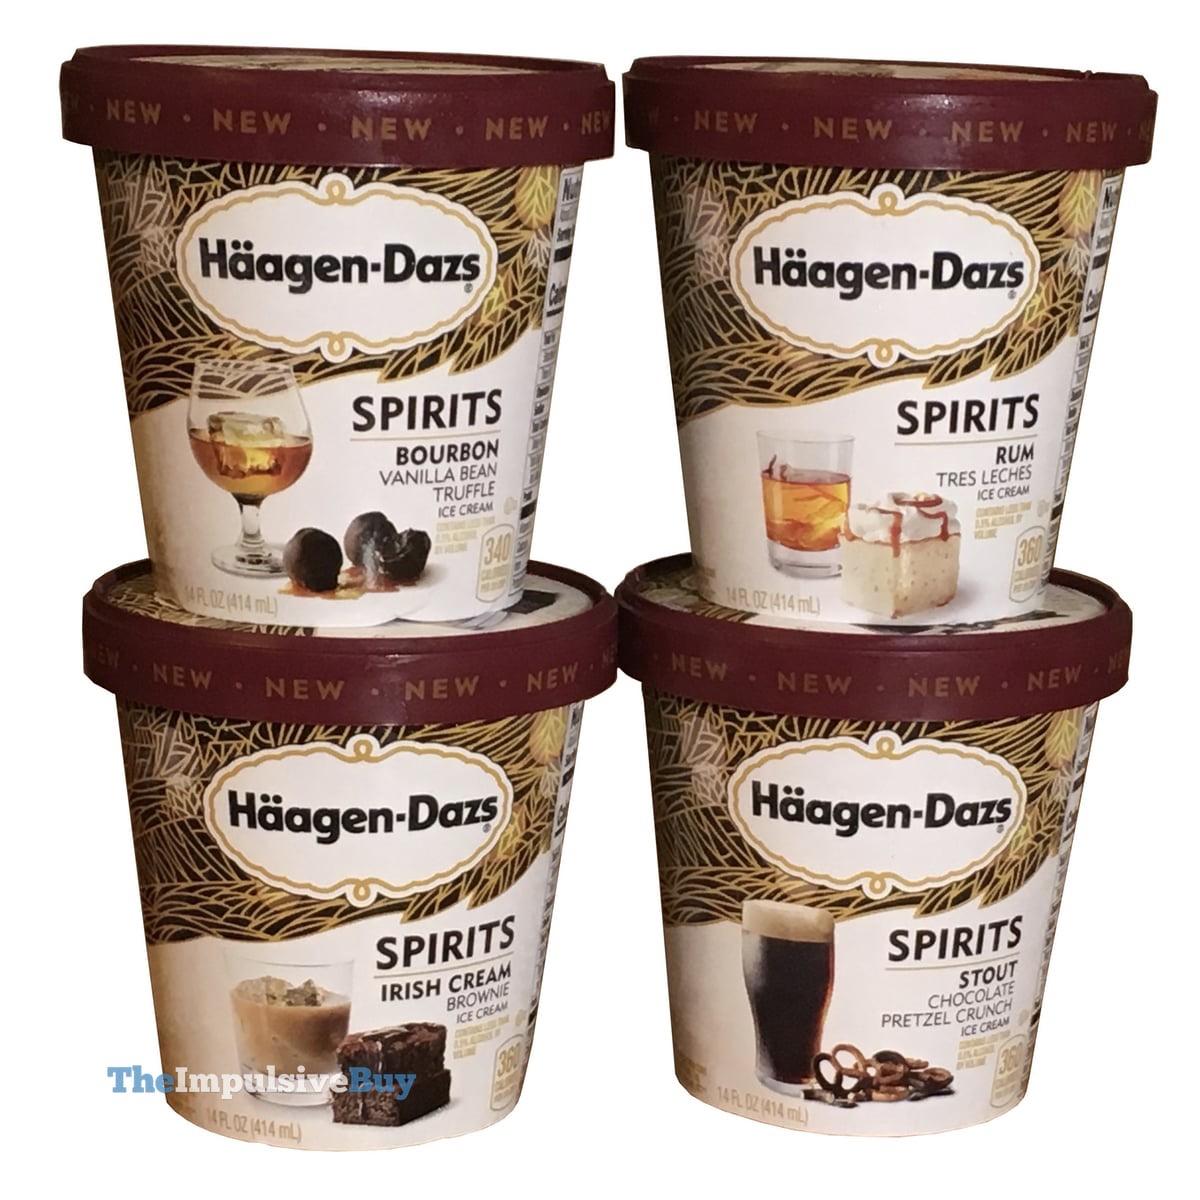 REVIEW: Haagen-Dazs Spirits Collection Ice Cream (U.S.) - The Impulsive Buy